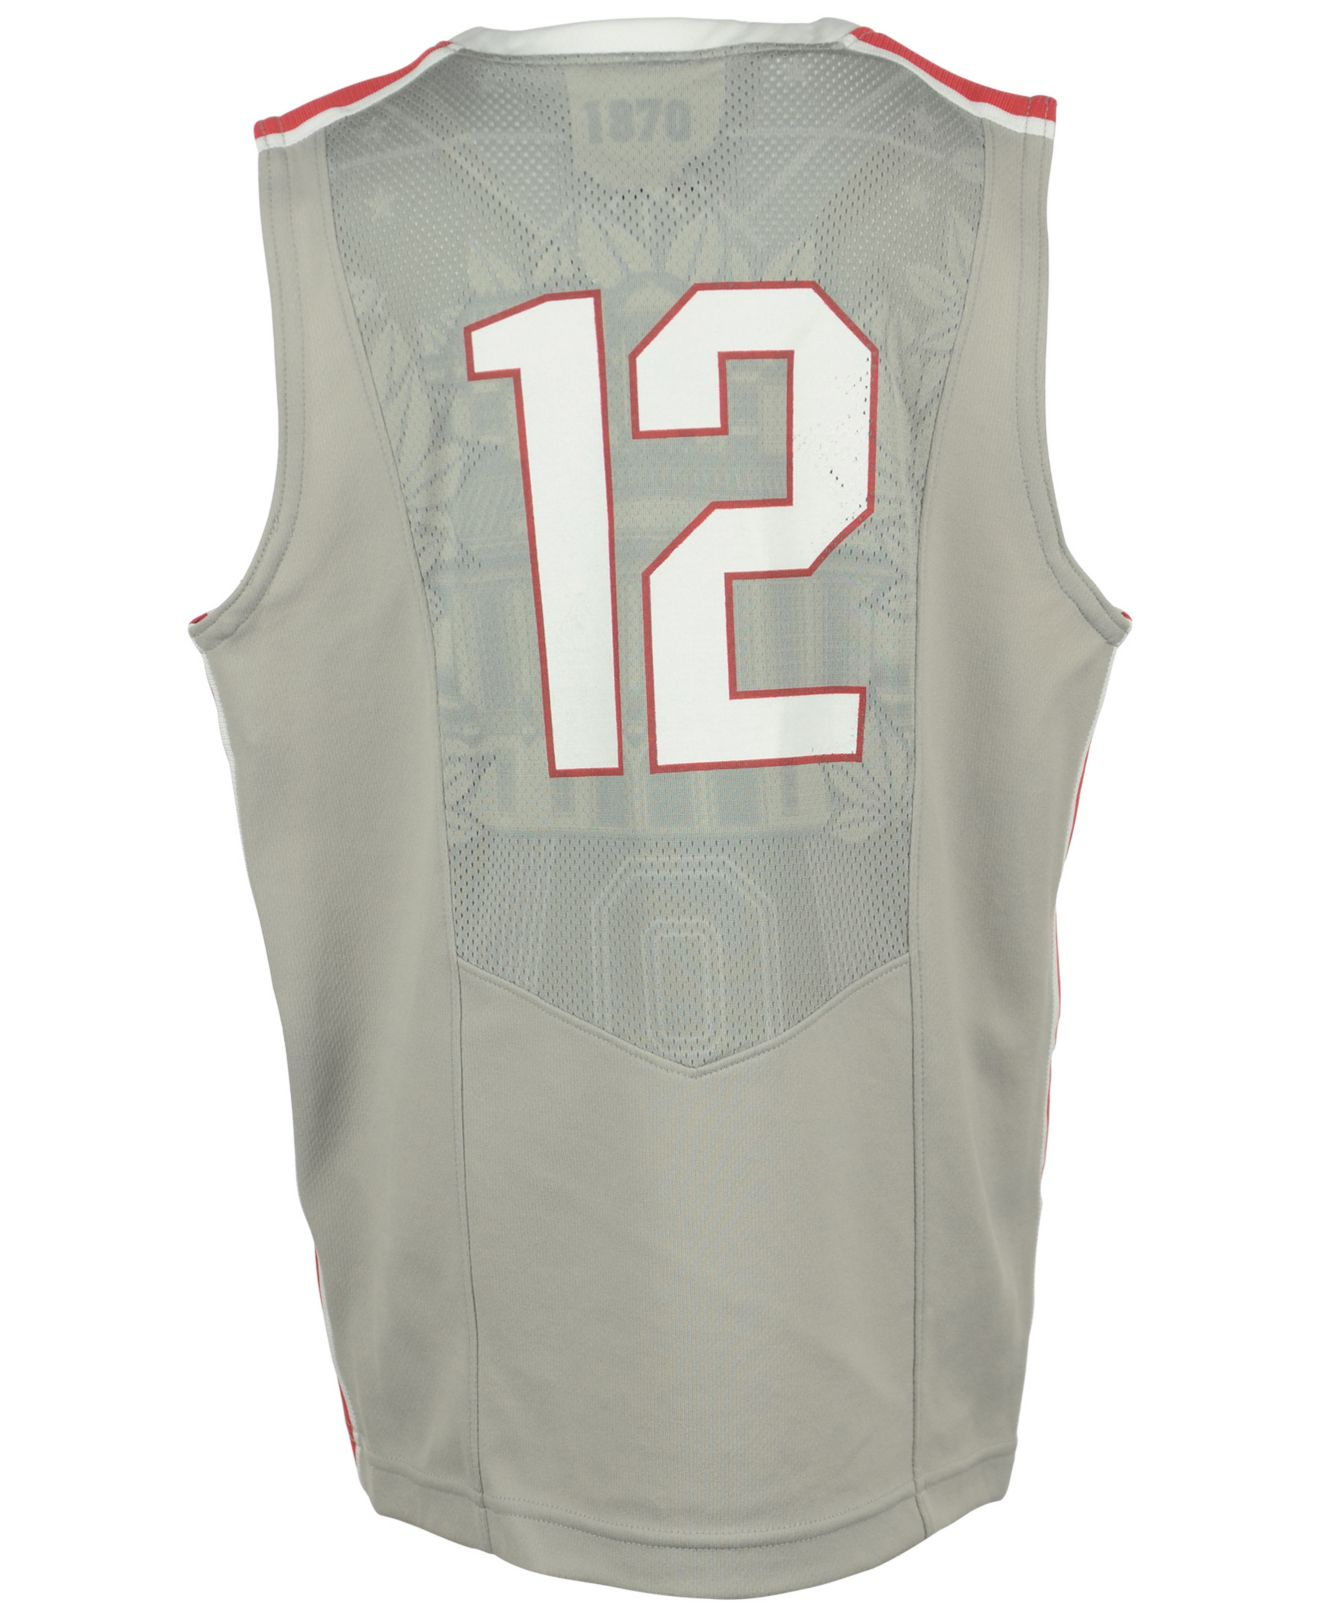 a613e38cde0 Lyst - Nike Boys  Ohio State Buckeyes Replica Basketball Jersey in Gray